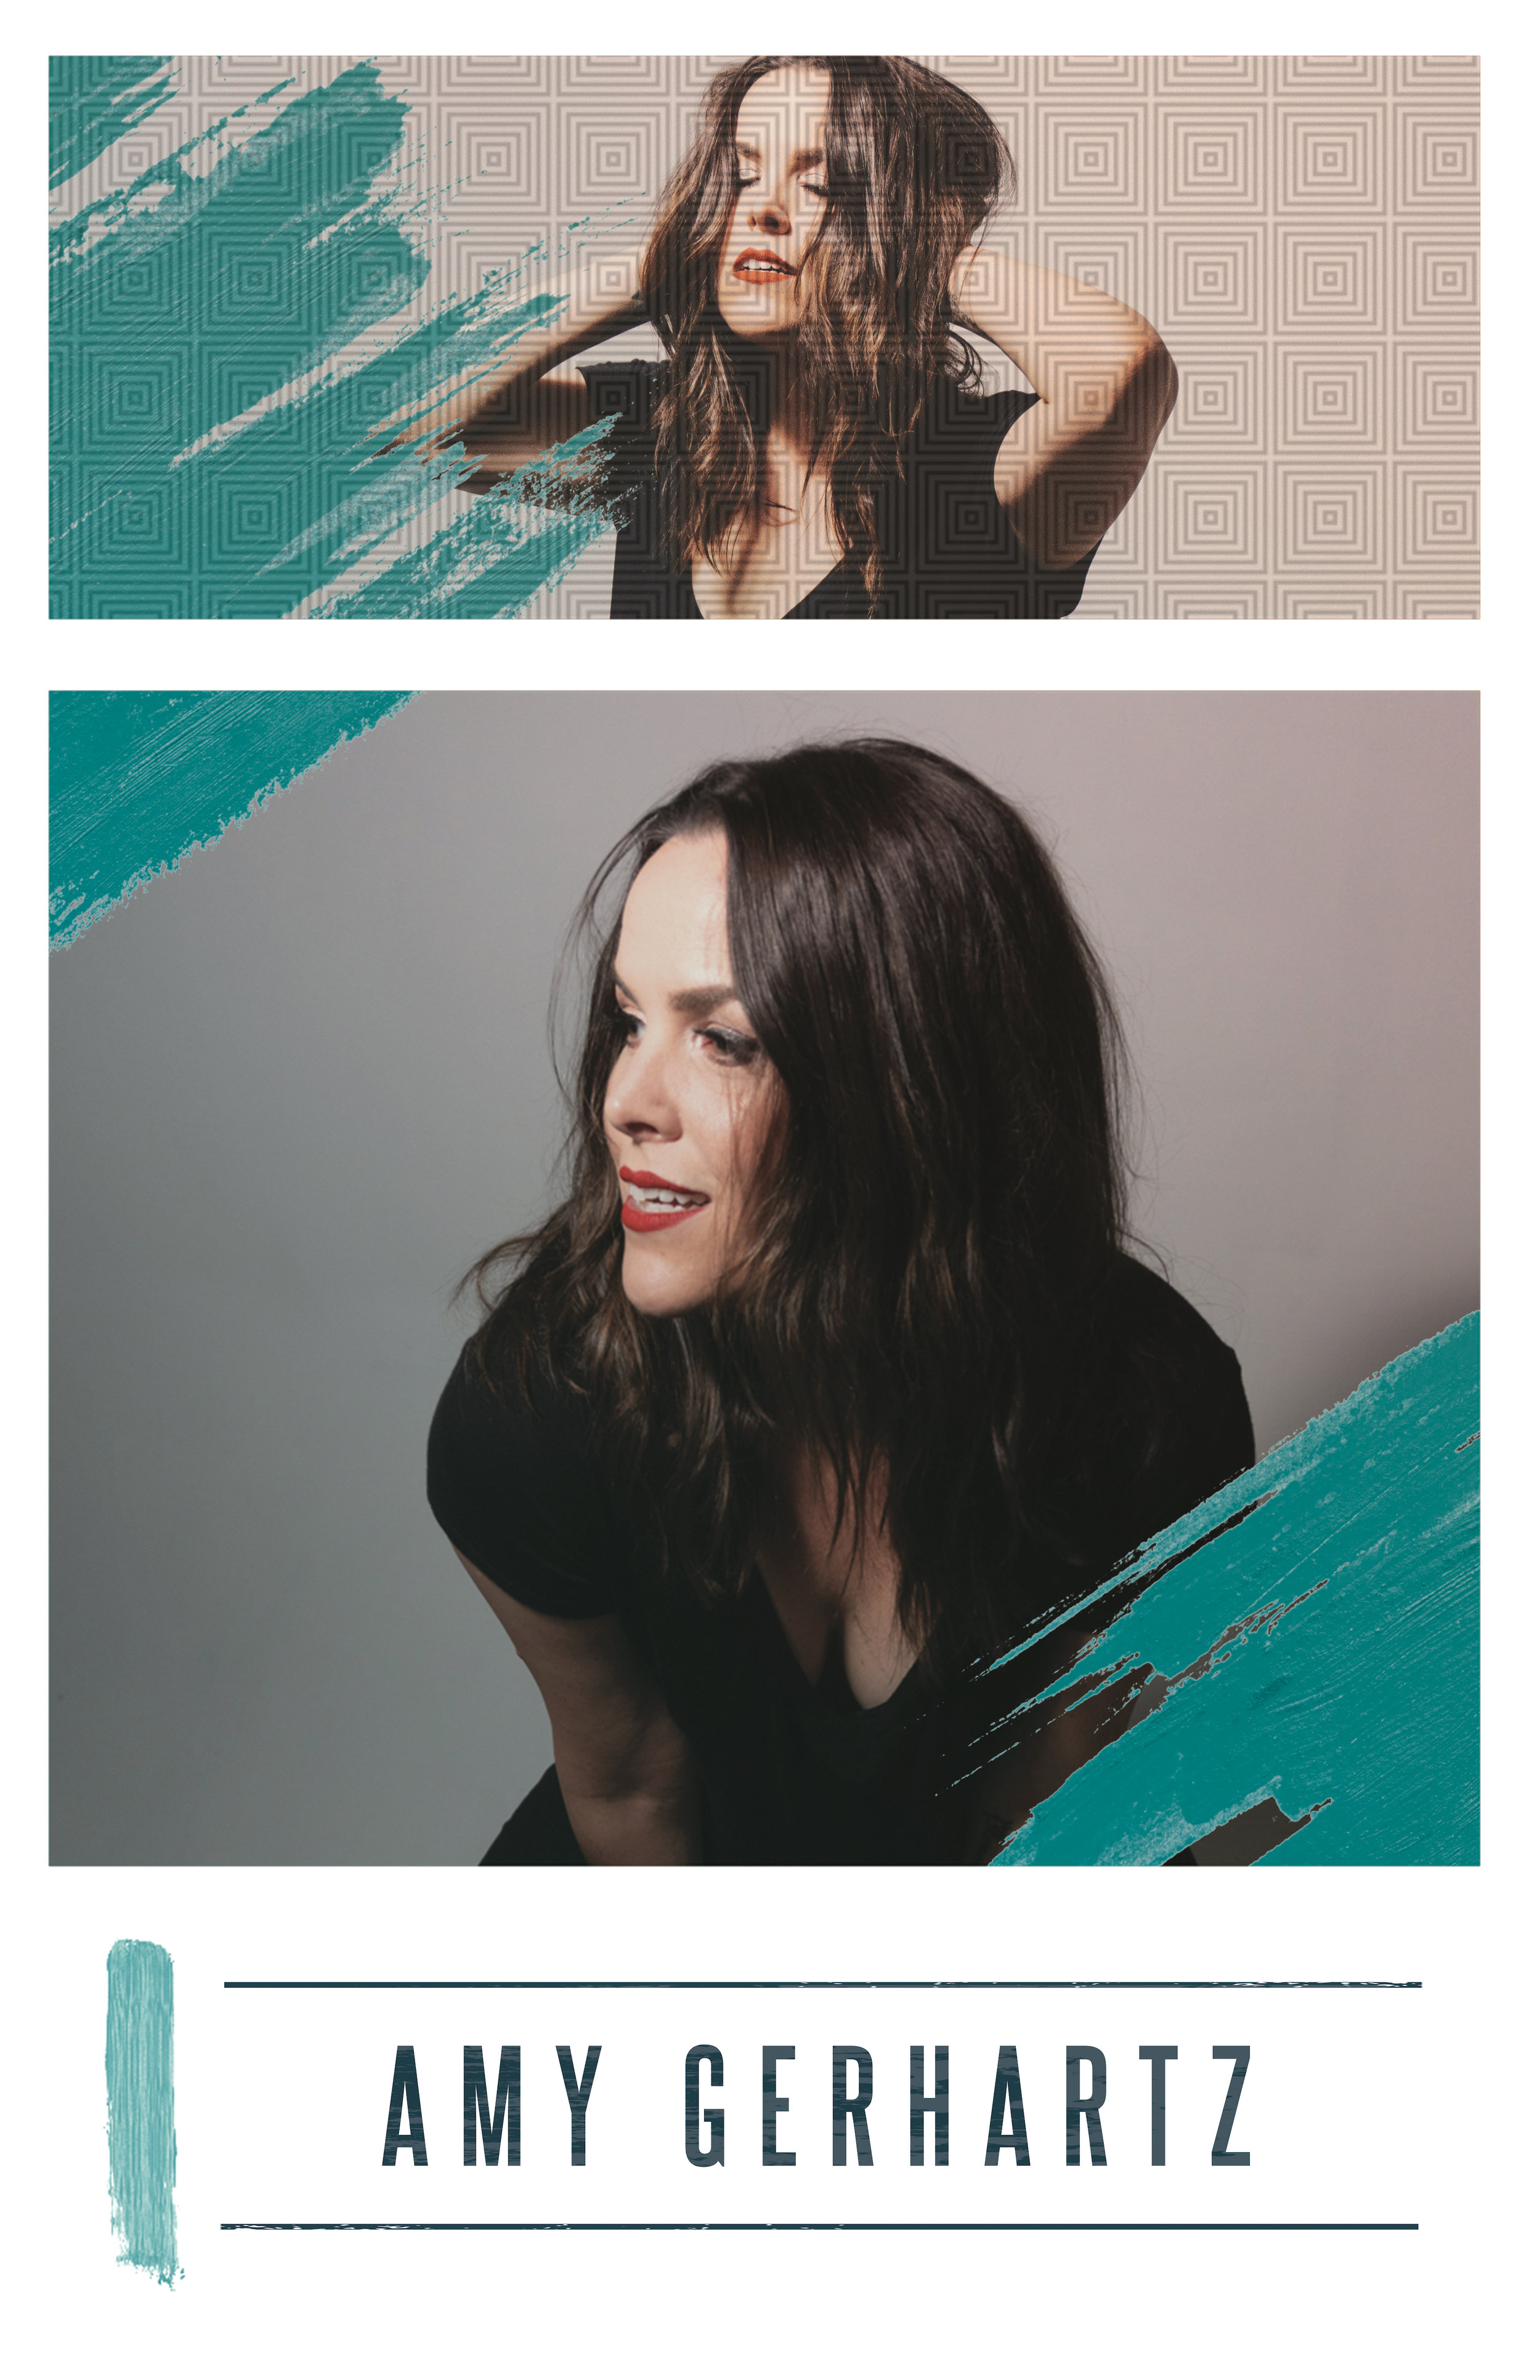 Amy Gerhartz - Artist Poster (2019) copy.jpg